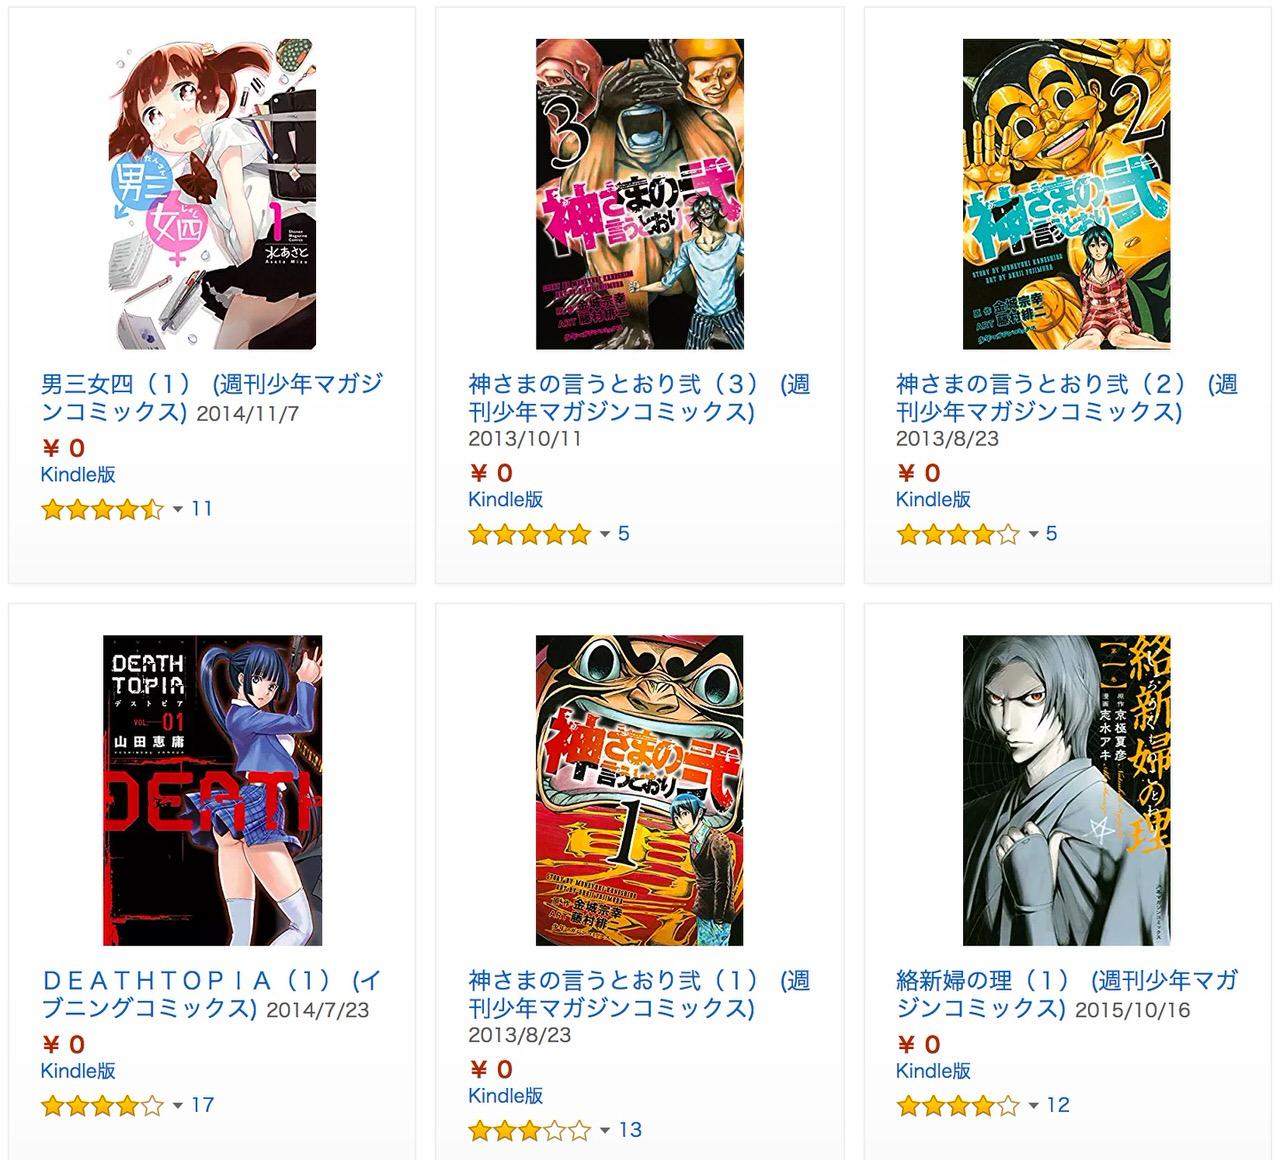 Amazon Kindle【期間限定無料多数】完結ホヤホヤマンガ特集(〜5月11日)神さまの言うとおり、さばげぶっ!、みんな!エスパーだよ!など